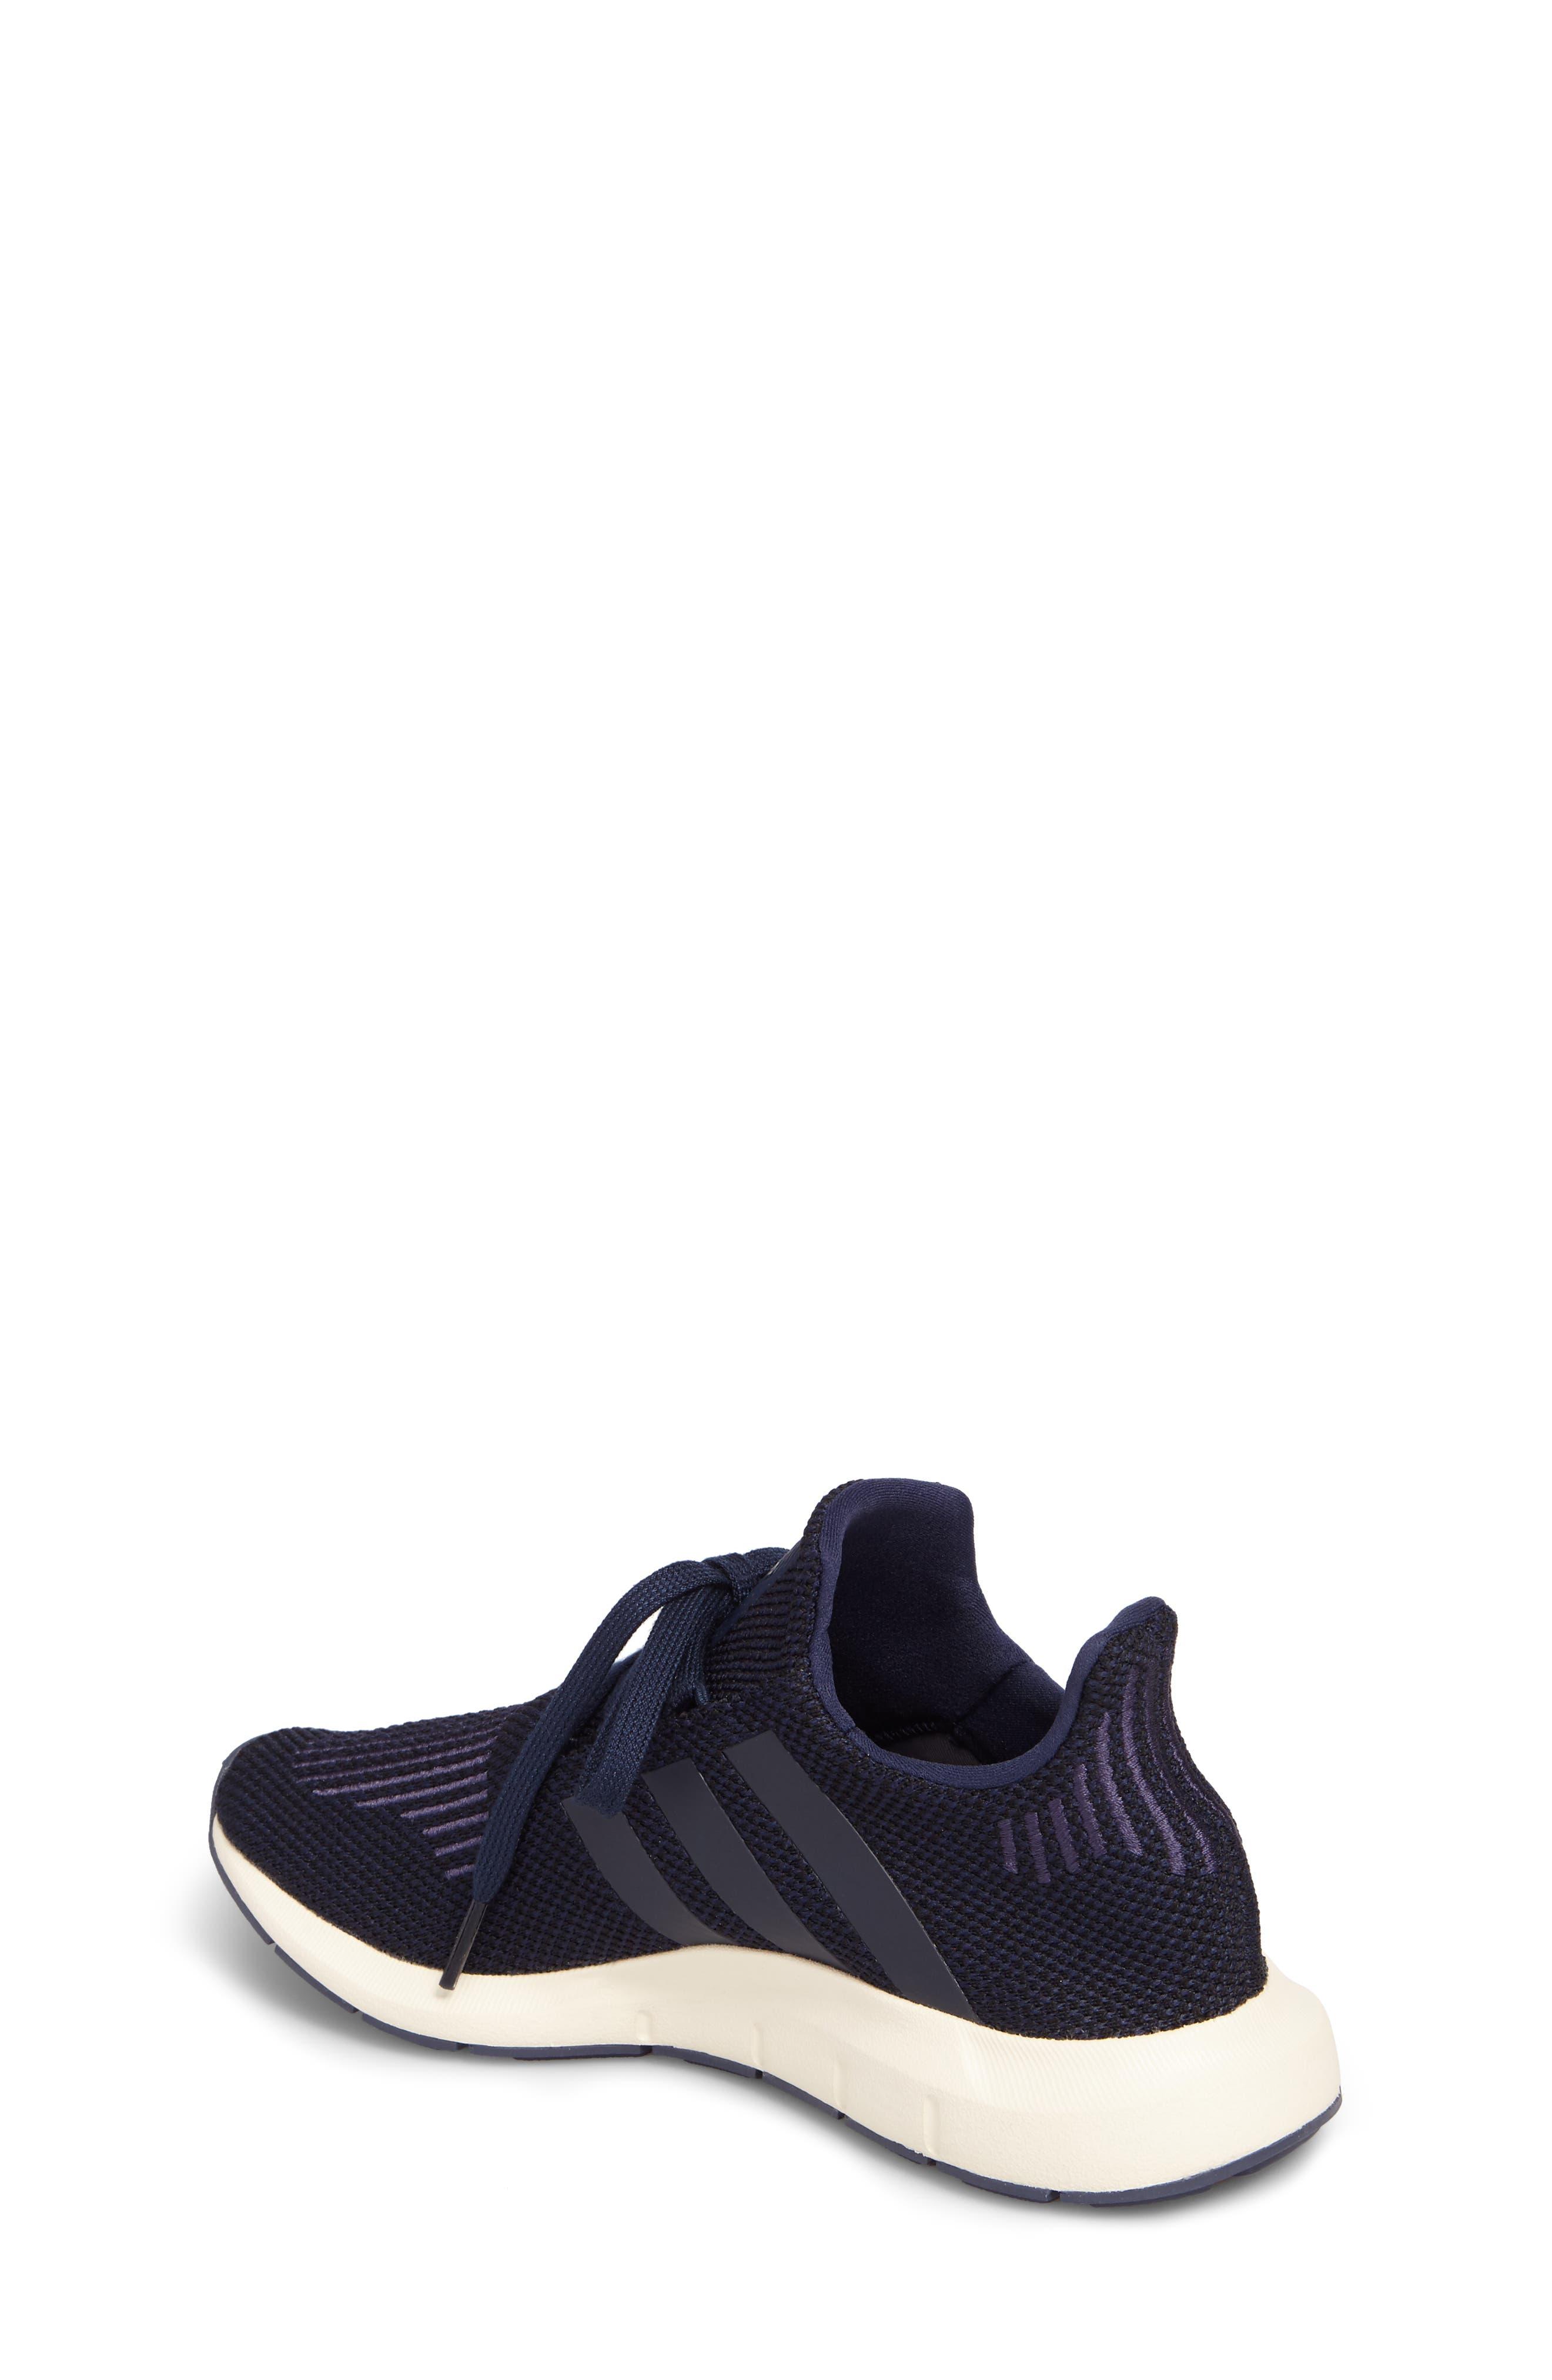 Alternate Image 2  - adidas Swift Run C Sneaker (Baby, Walker, Toddler, Little Kid & Big Kid)